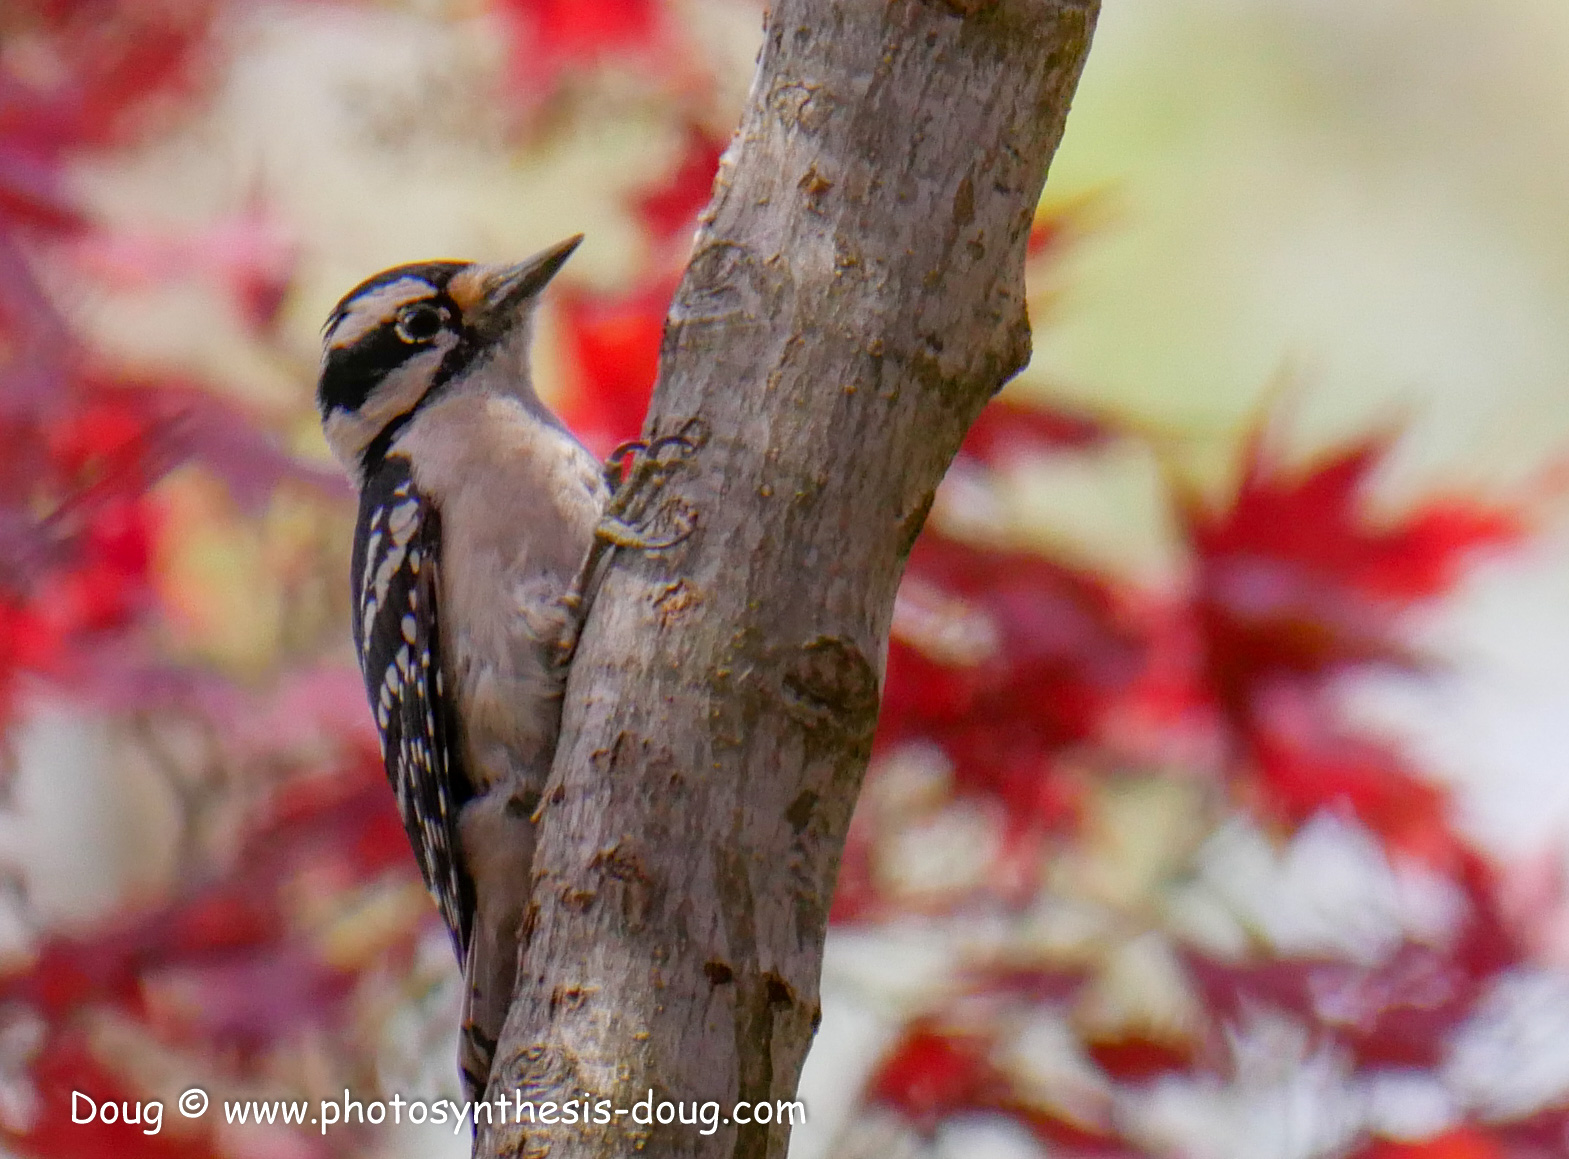 Merkle WLR April birds-1030580.JPG